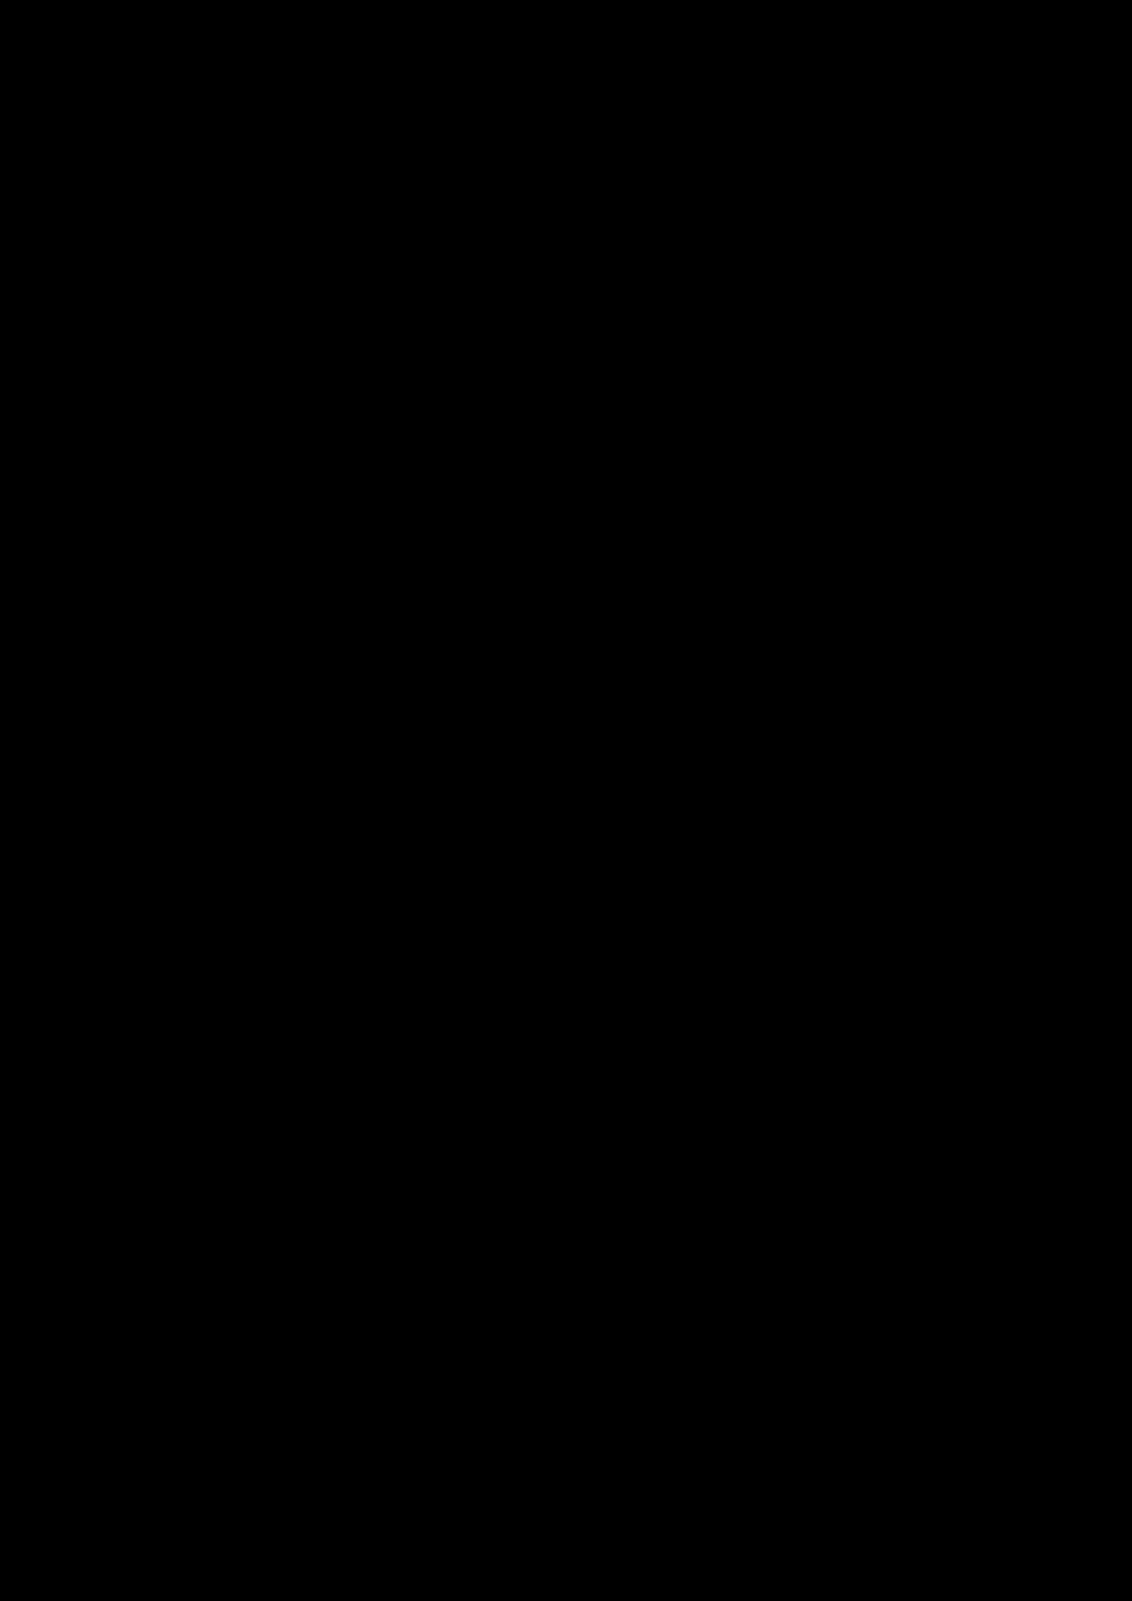 Ispoved Pervogo Boga slide, Image 75